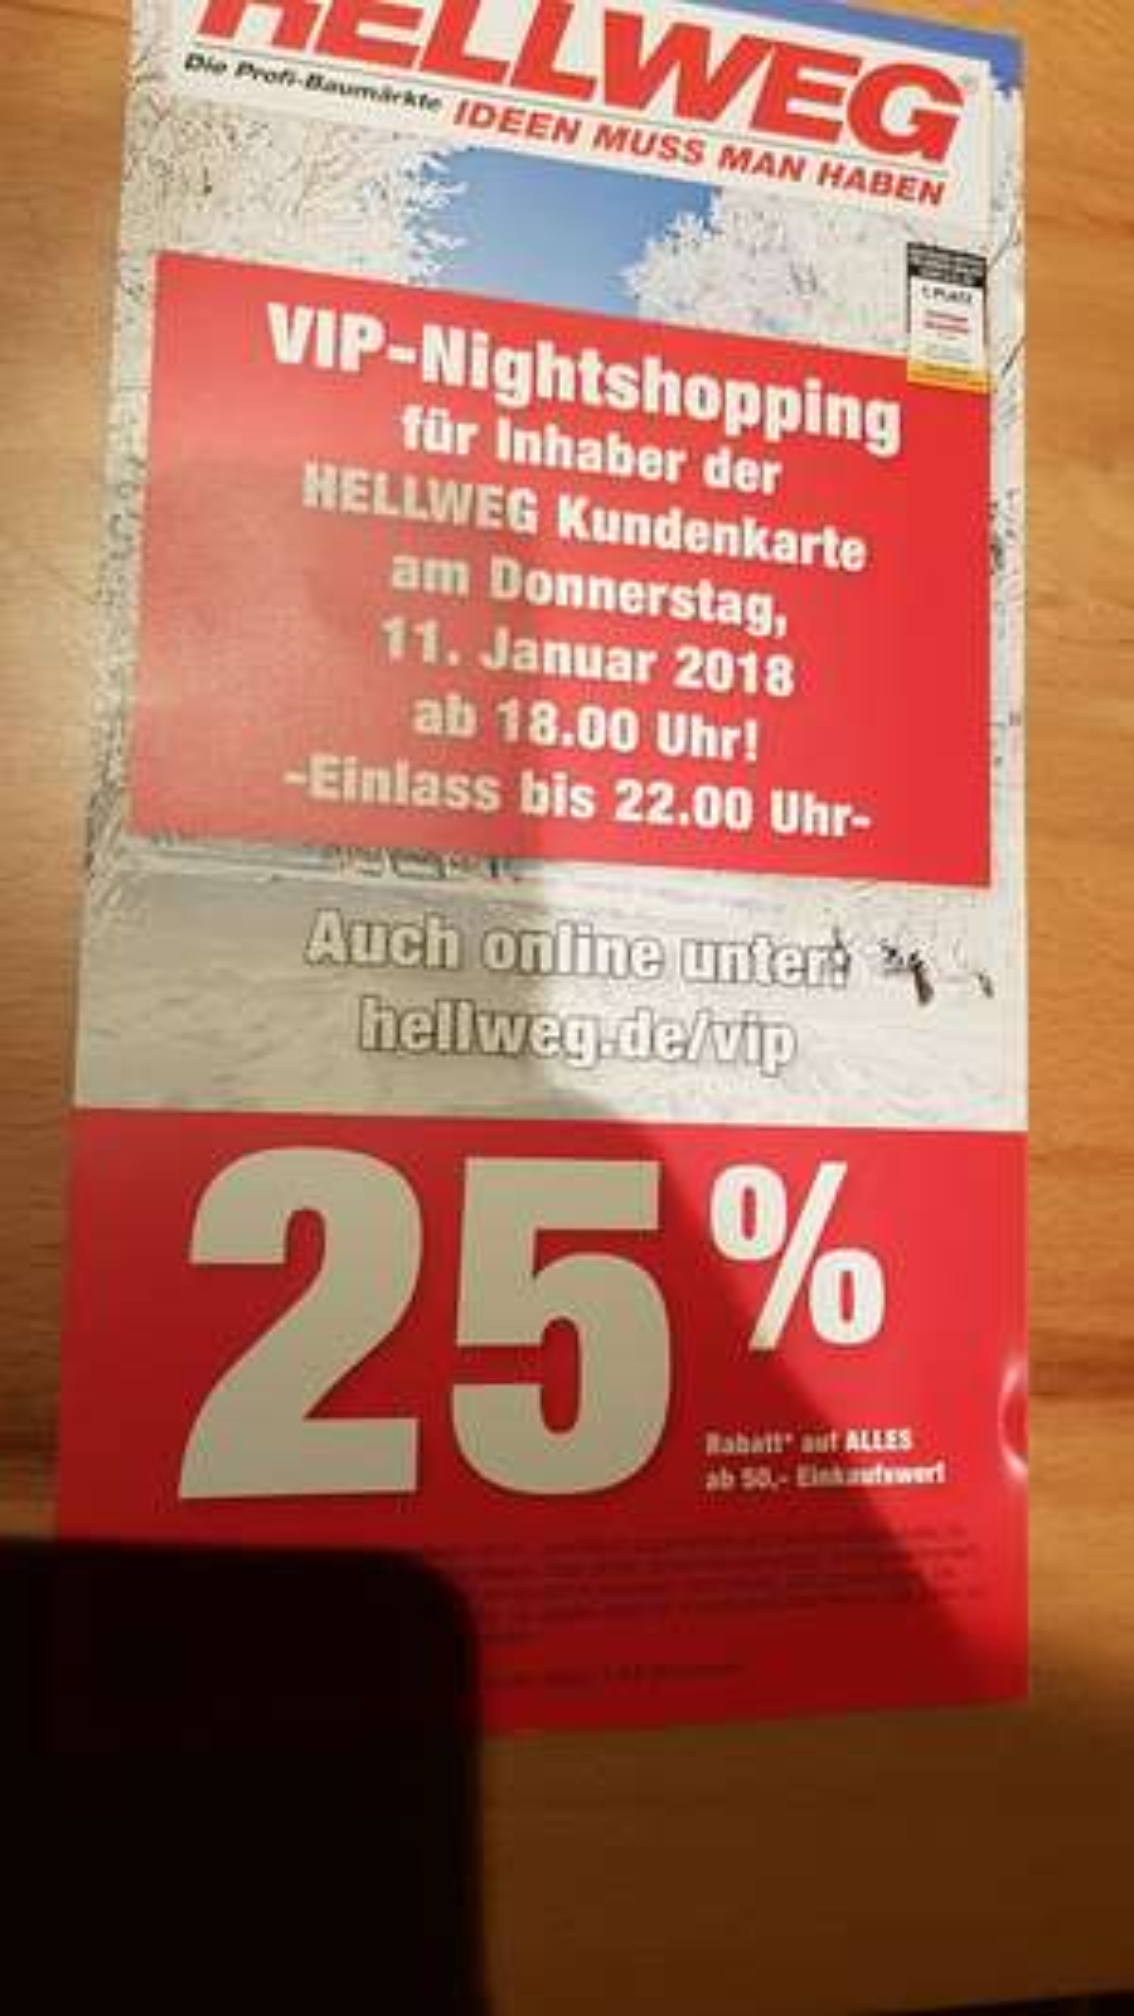 HELLWEG Baumarkt VIP-Nightshopping, 25% ab 50€ MBW